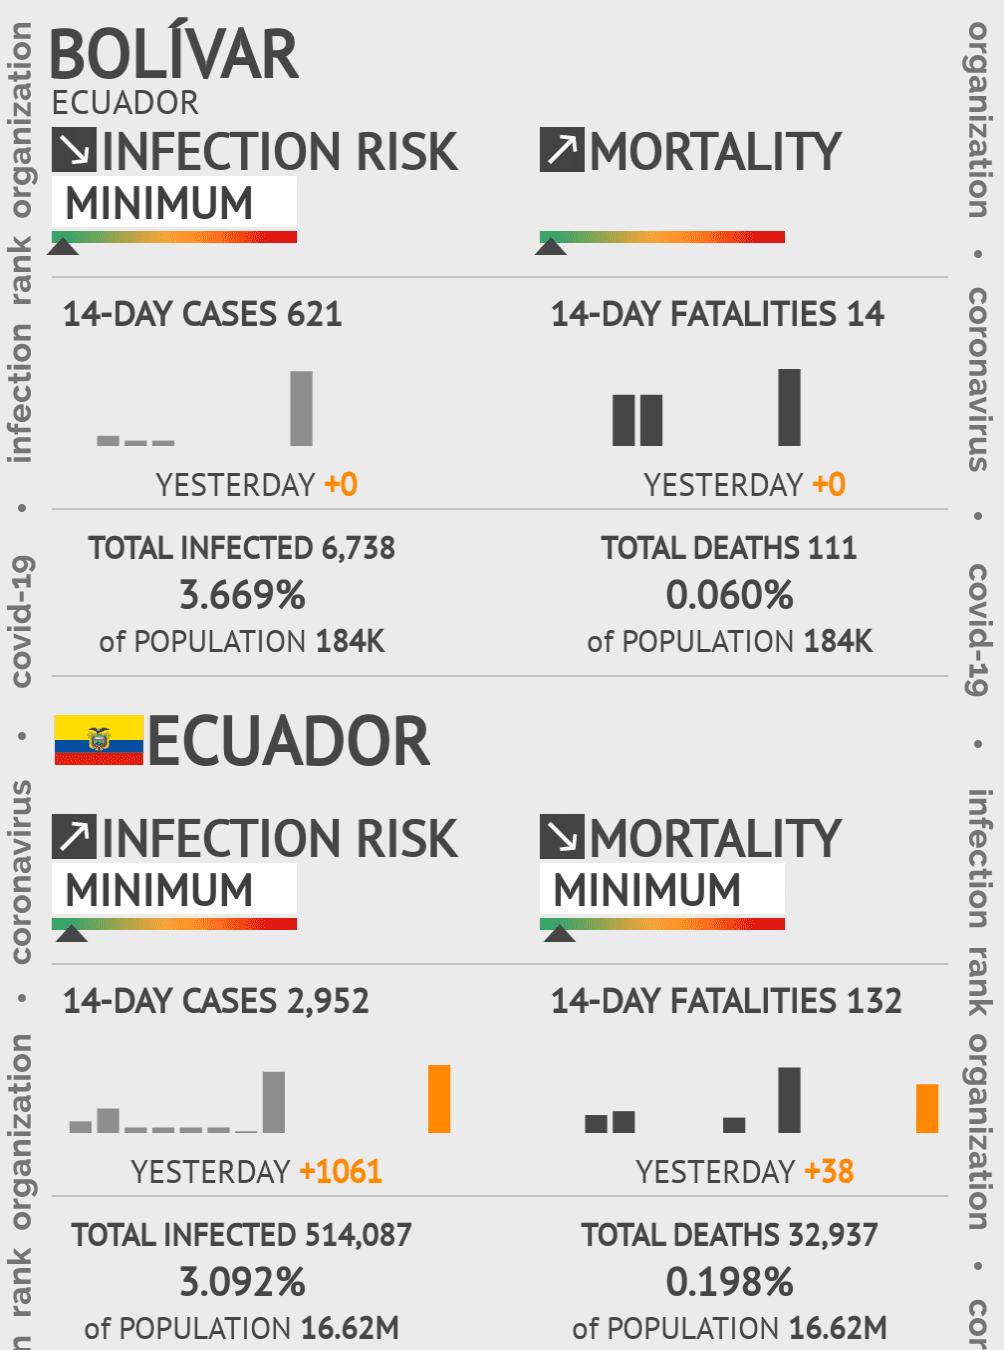 Bolívar Coronavirus Covid-19 Risk of Infection on February 22, 2021